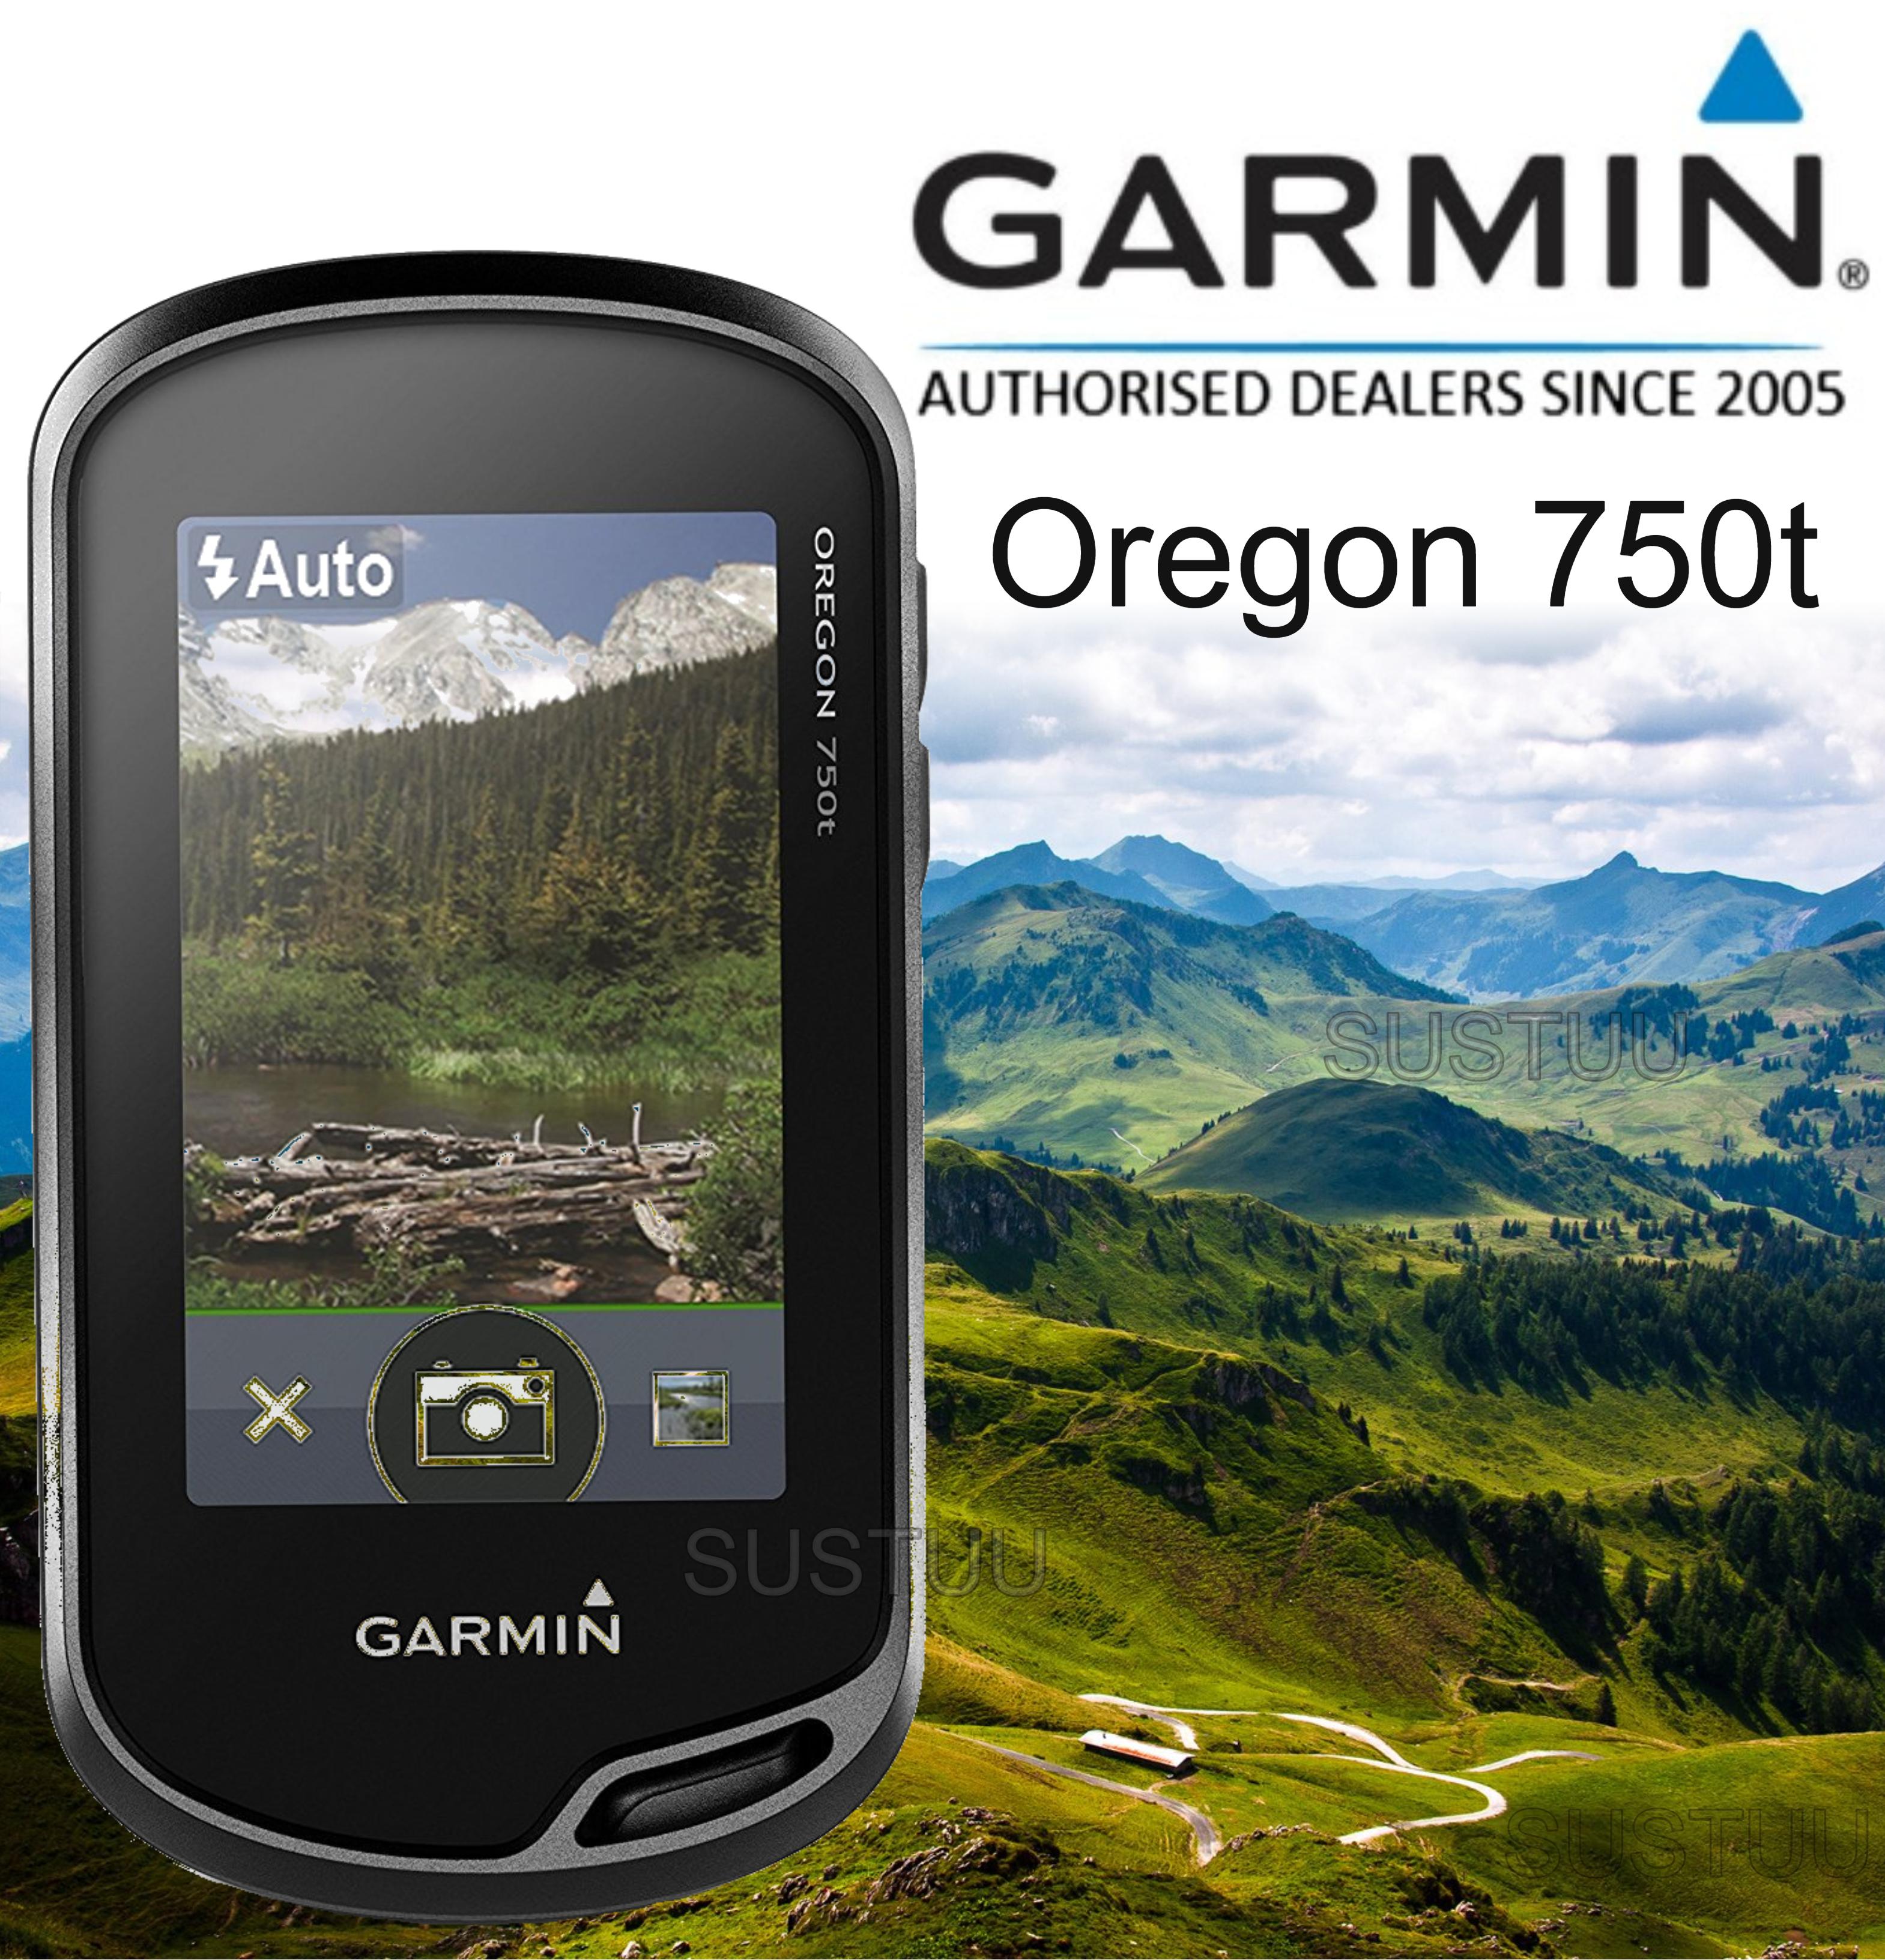 Garmin Oregon 750T Handheld GPS + Europe TopoActive Maps | Built-in Wi-Fi & Camera